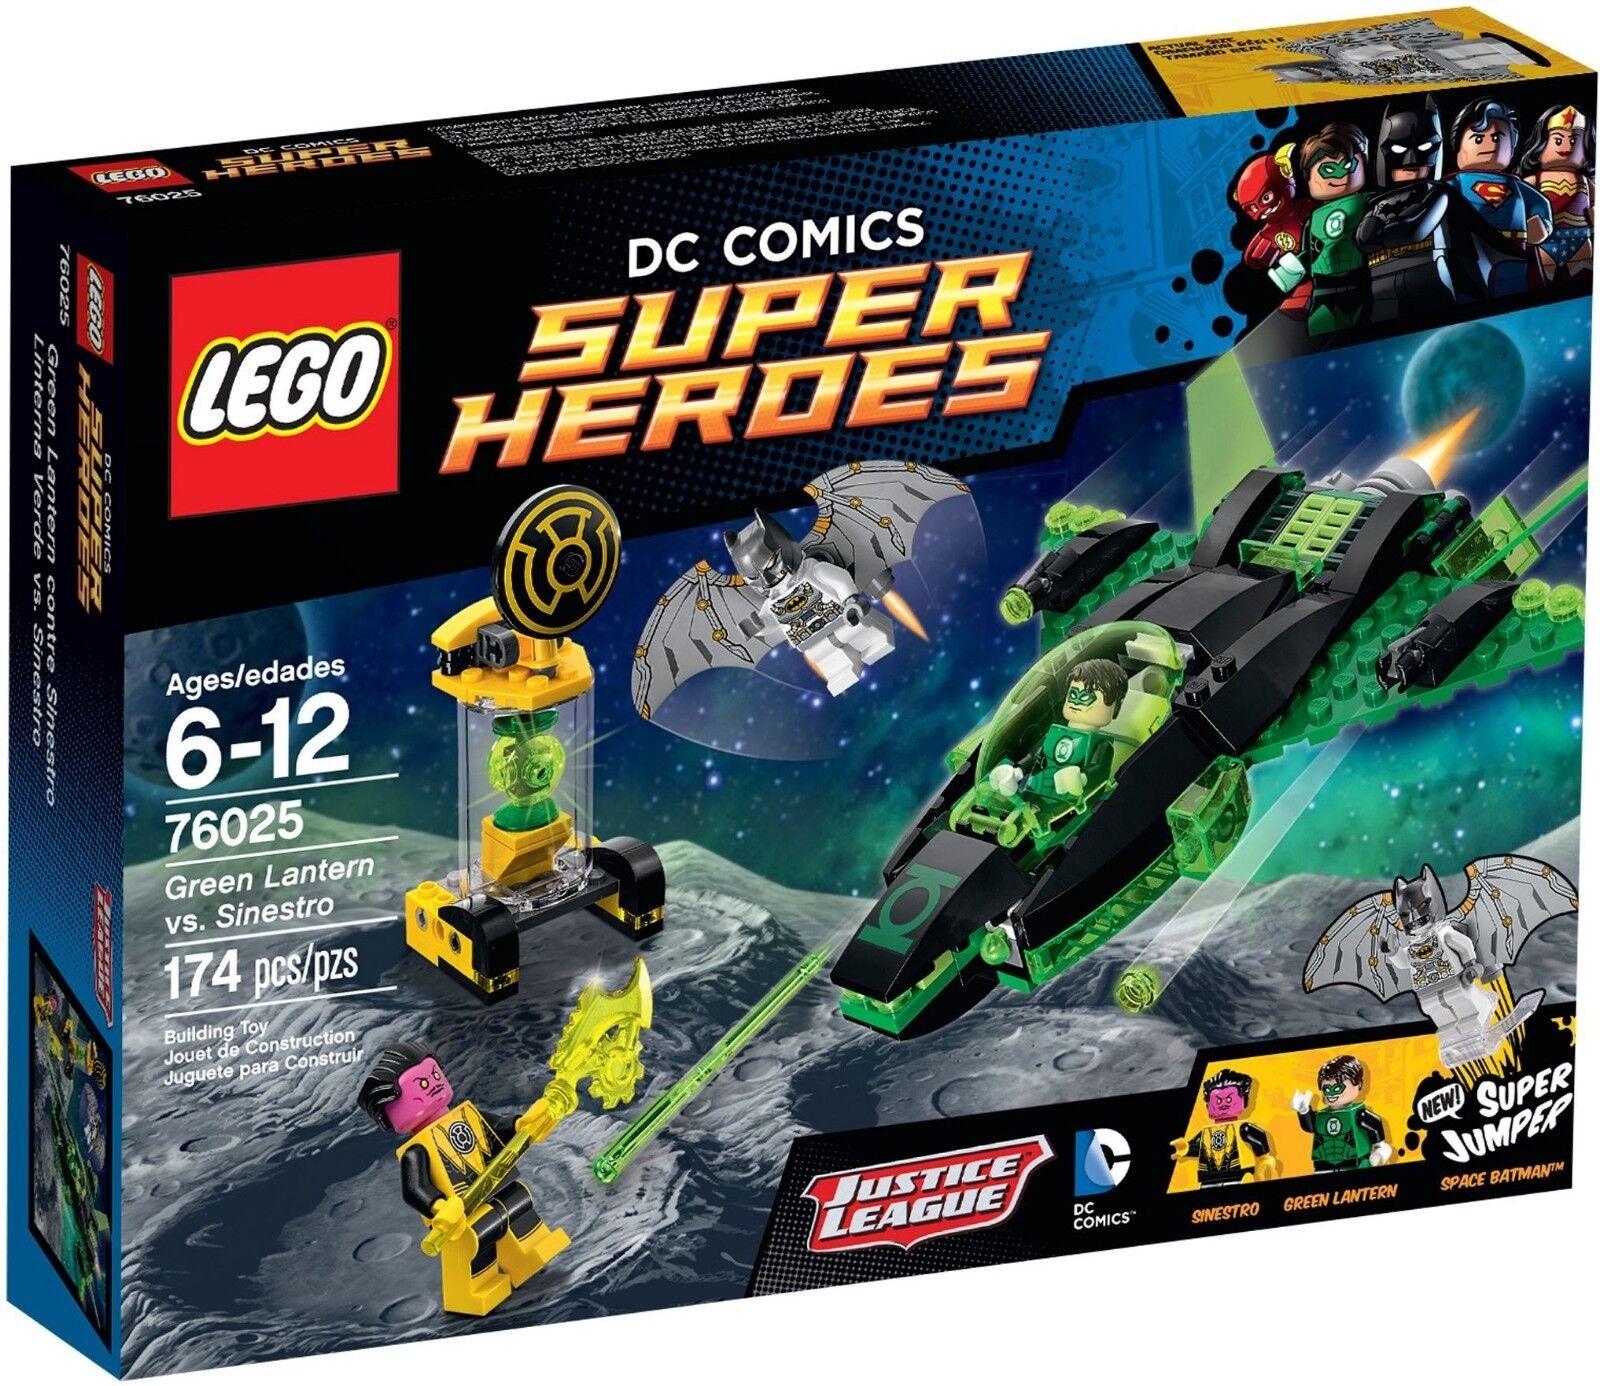 Lego DC Comics Green Lantern V's Sinestra 76025 - Brand new